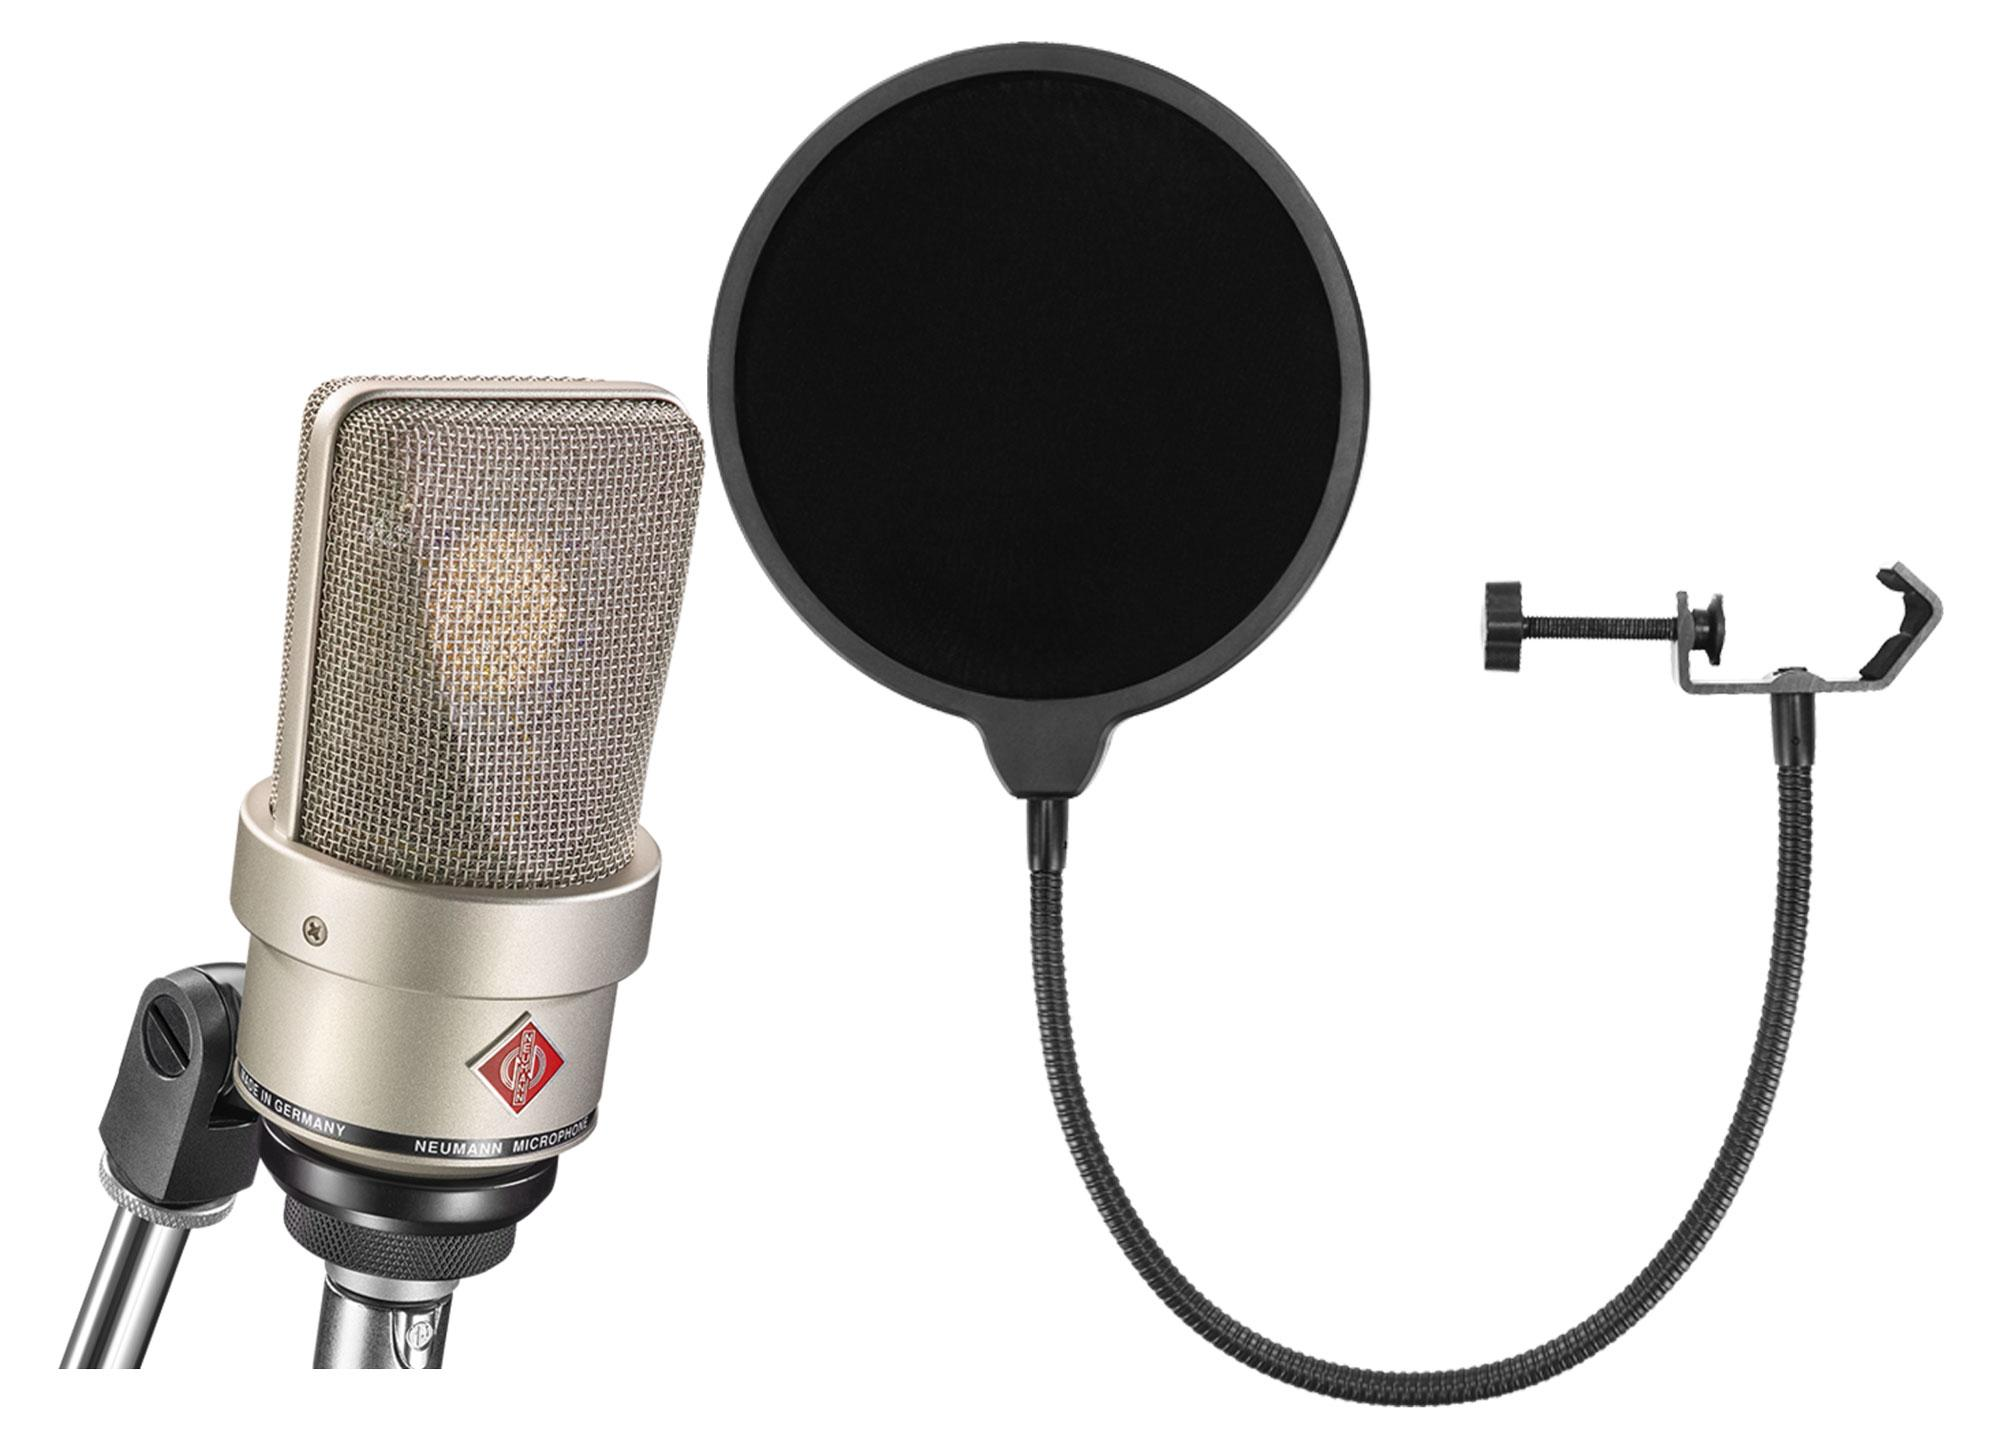 Mikrofone - Neumann TLM 103 NI Mikrofon Set inkl. Popkiller - Onlineshop Musikhaus Kirstein